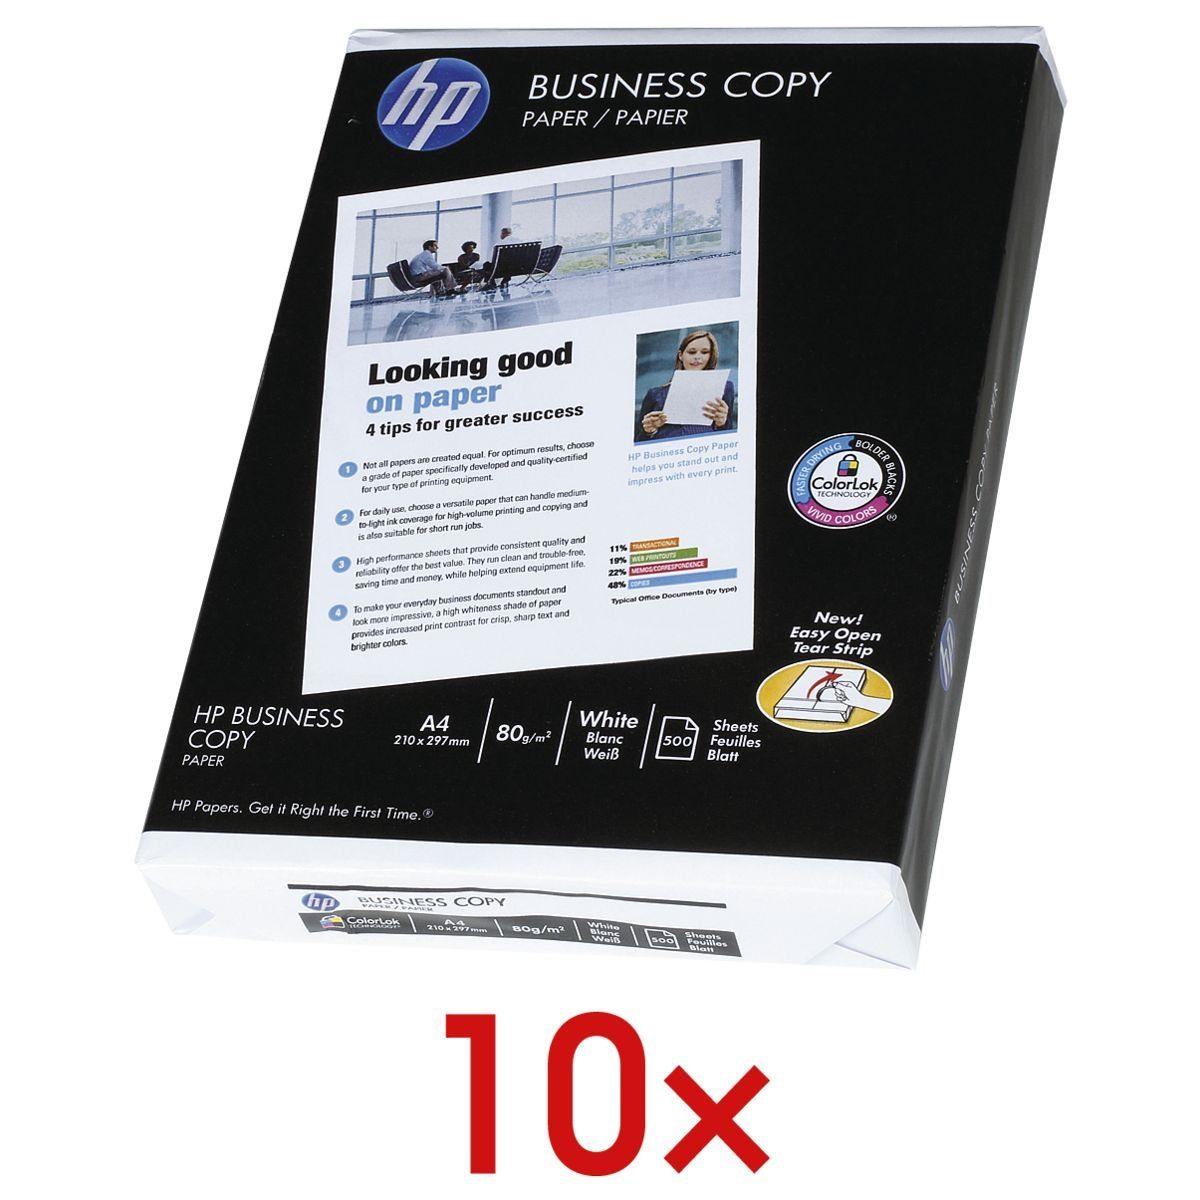 HP 10x Kopierpapier »Business Copy« 1 Set